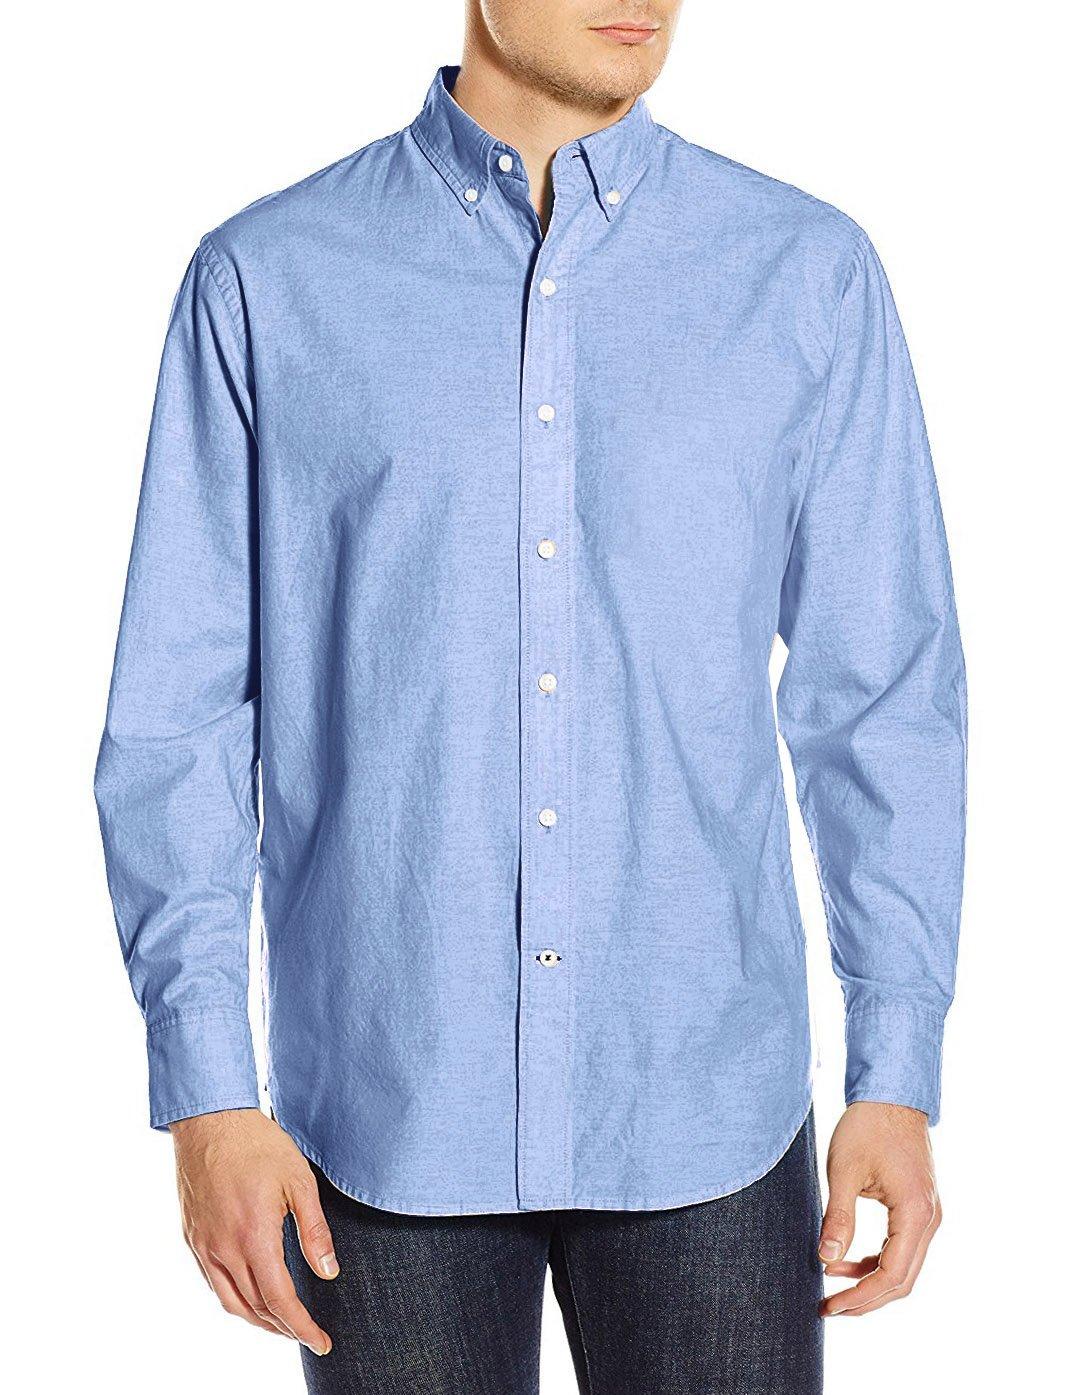 TOPORUS Men's Solid Slim Fit Long Sleeve Button Down Oxford Dress Shirt